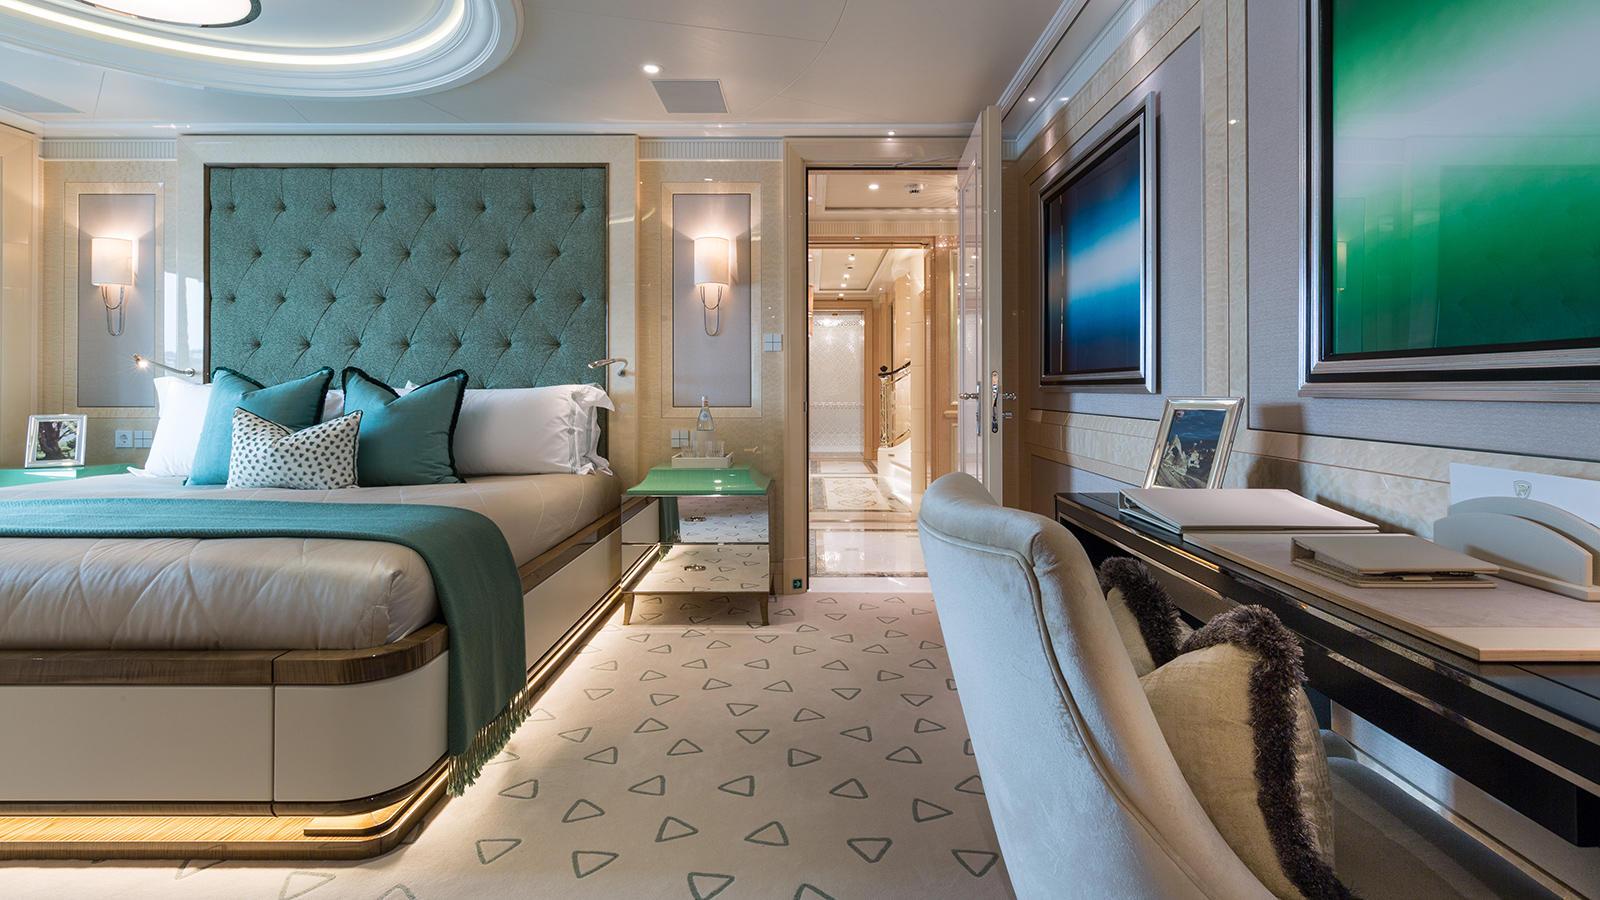 rdJoFQZwSwOPfk0VCjx4_Plvs-Vltra-Amels-LE242-yacht-guest-cabin-credit-Jeff-Brown-1600x900